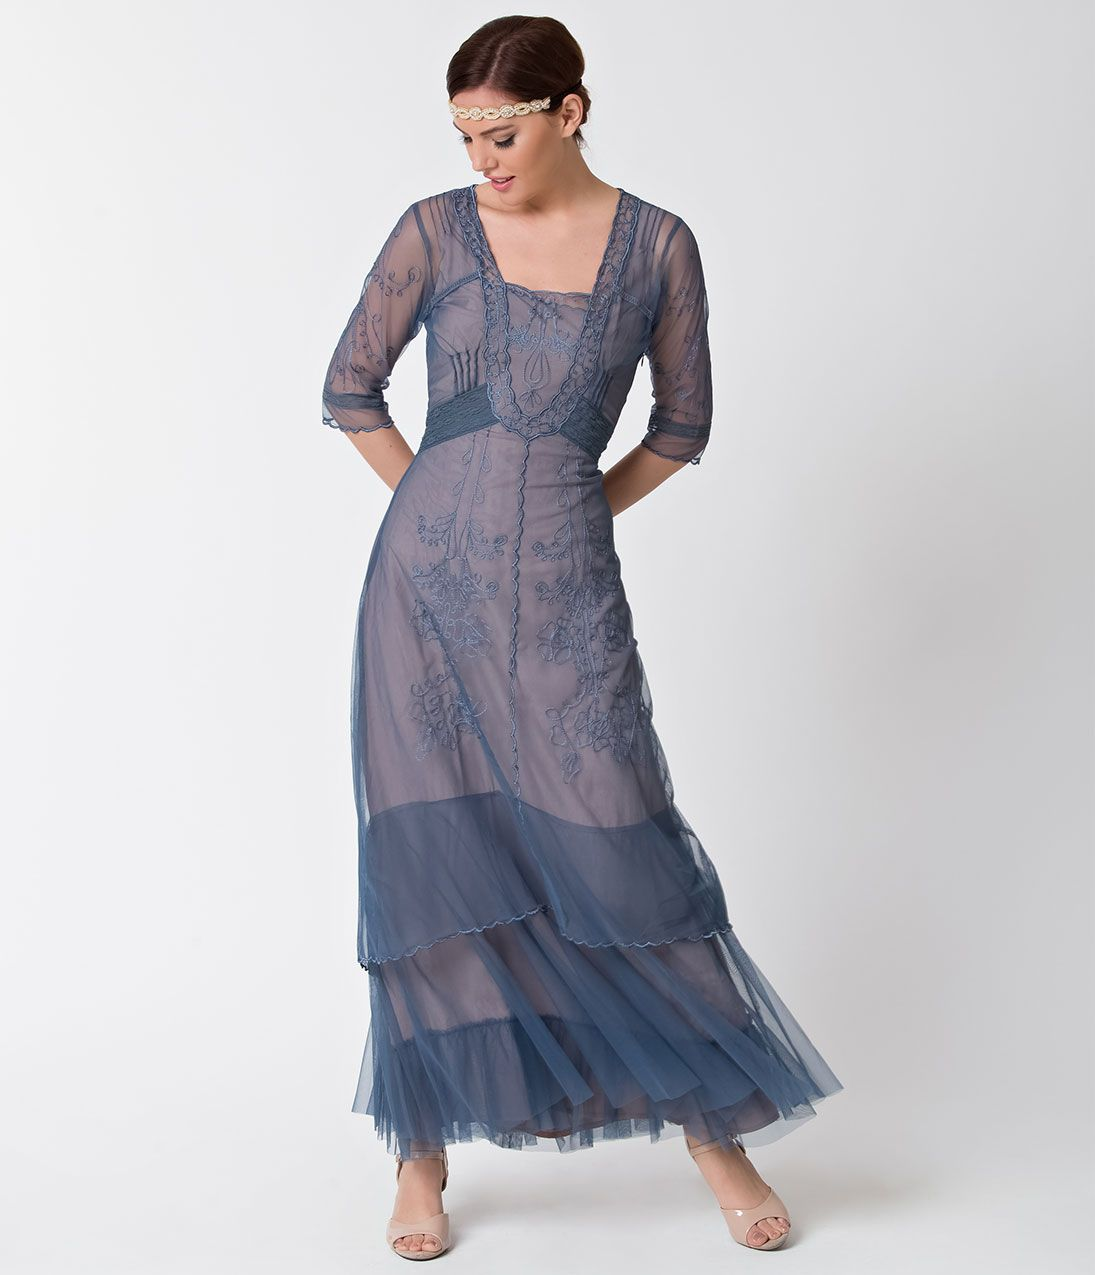 1930s Day Dresses Tea Dresses House Dresses Edwardian Dress Vintage Homecoming Dresses Fabulous Dresses [ 1275 x 1095 Pixel ]